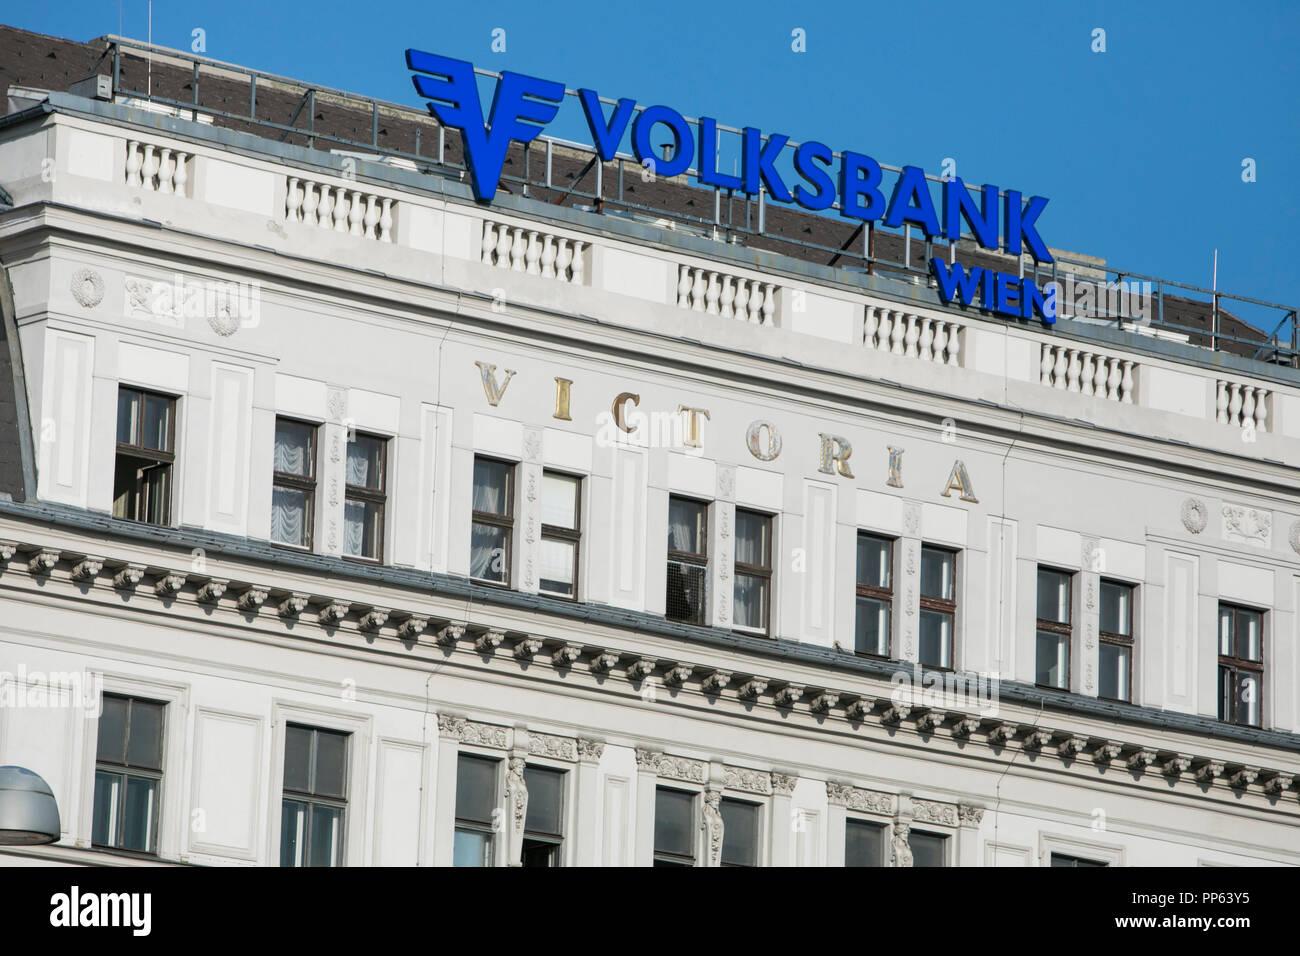 Volksbank Stock Photos Volksbank Stock Images Alamy